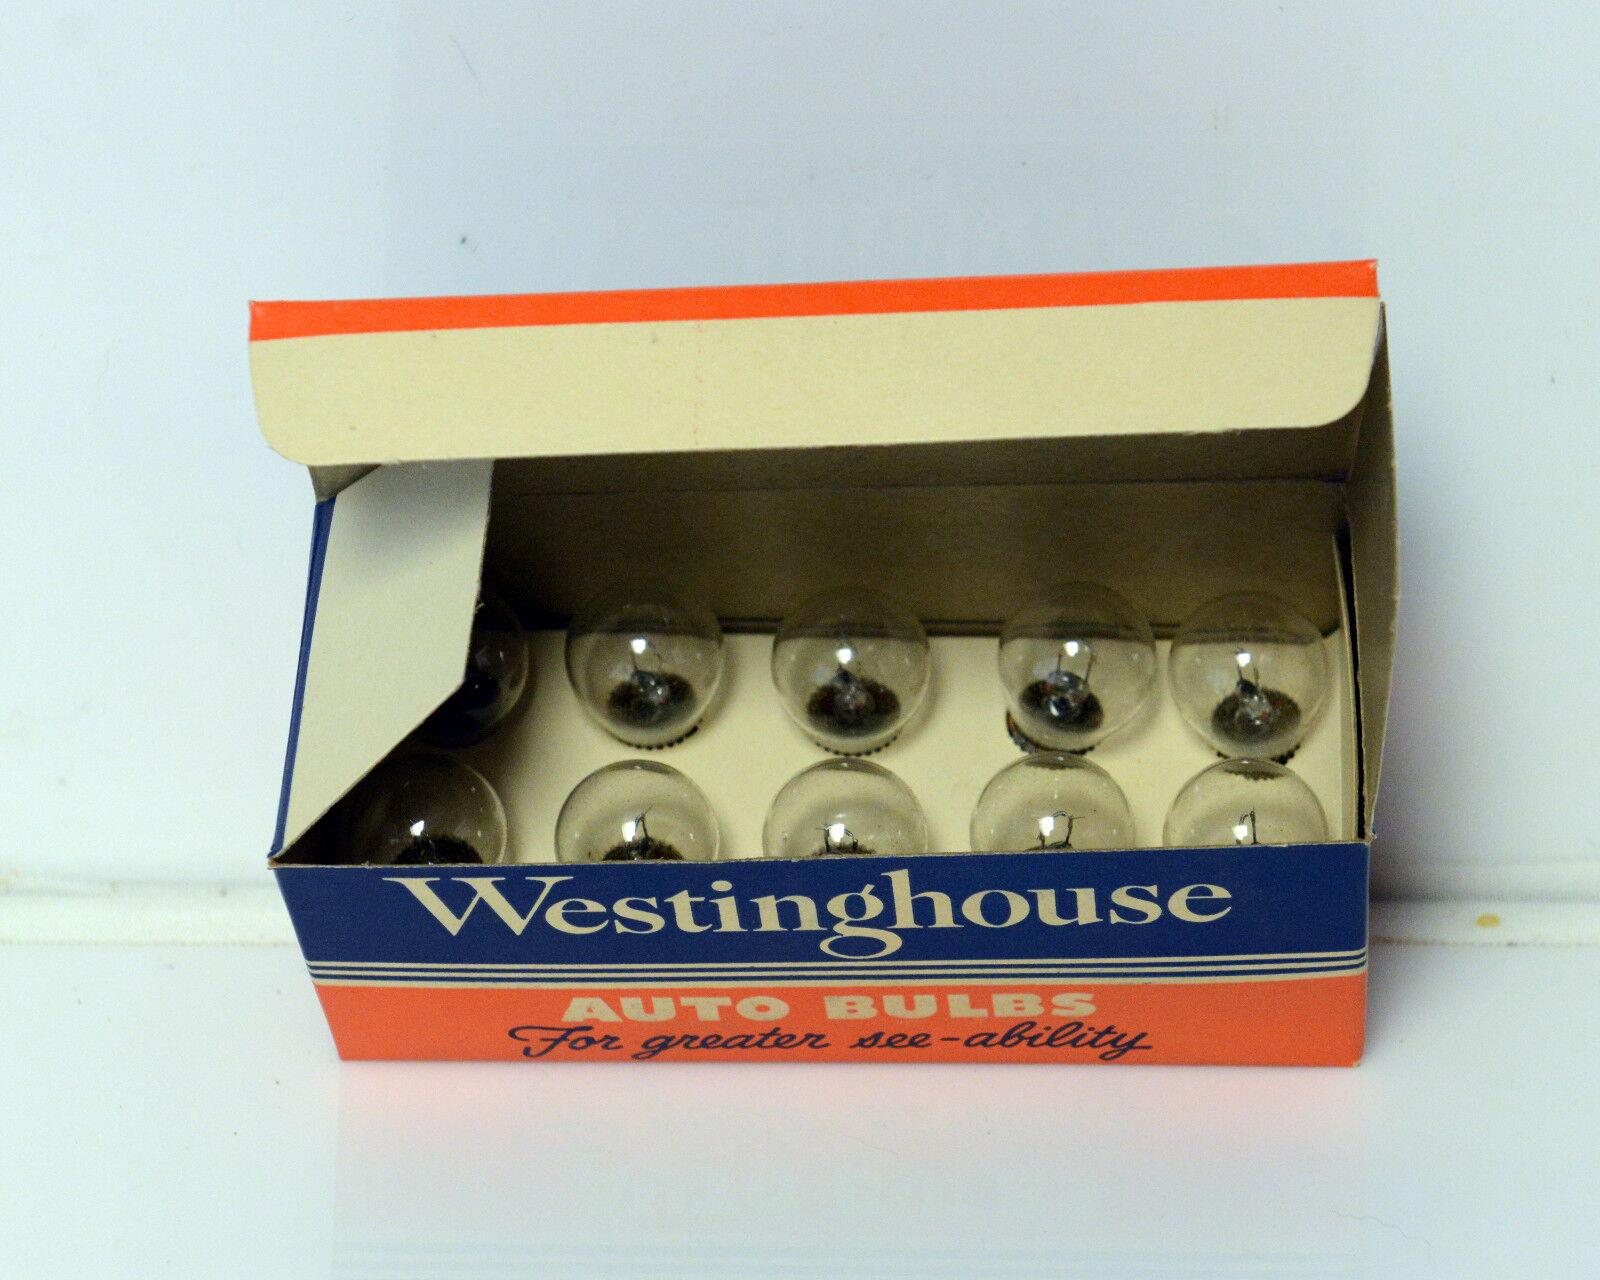 Westinghouse Light Bulbs NOS Vintage Advertising lamp 1129 Headlight Signal